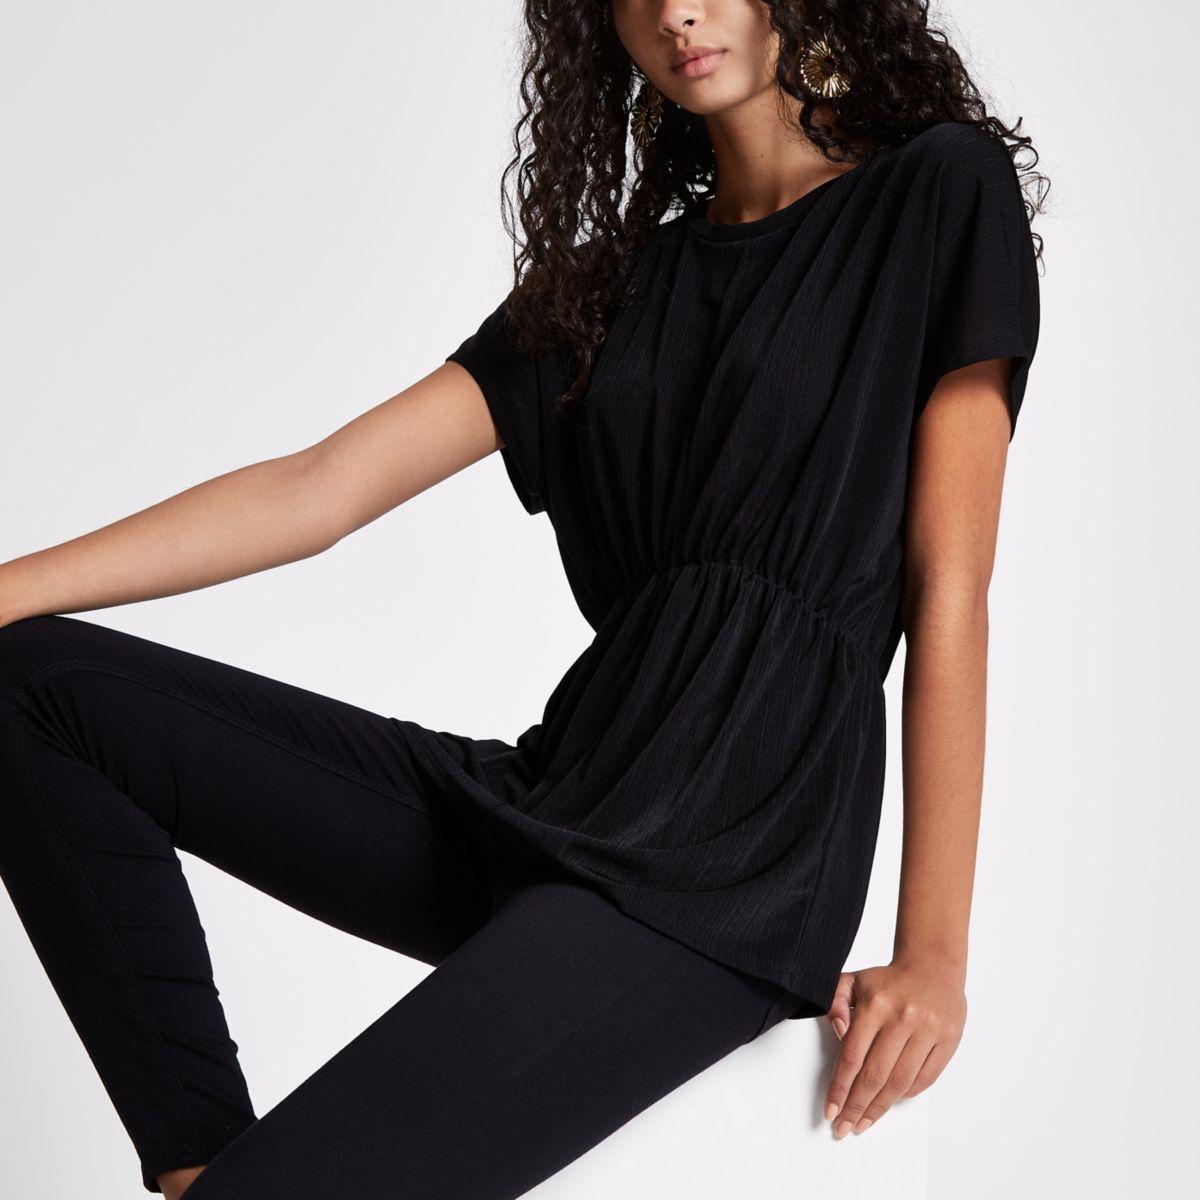 Black short sleeve batwing top